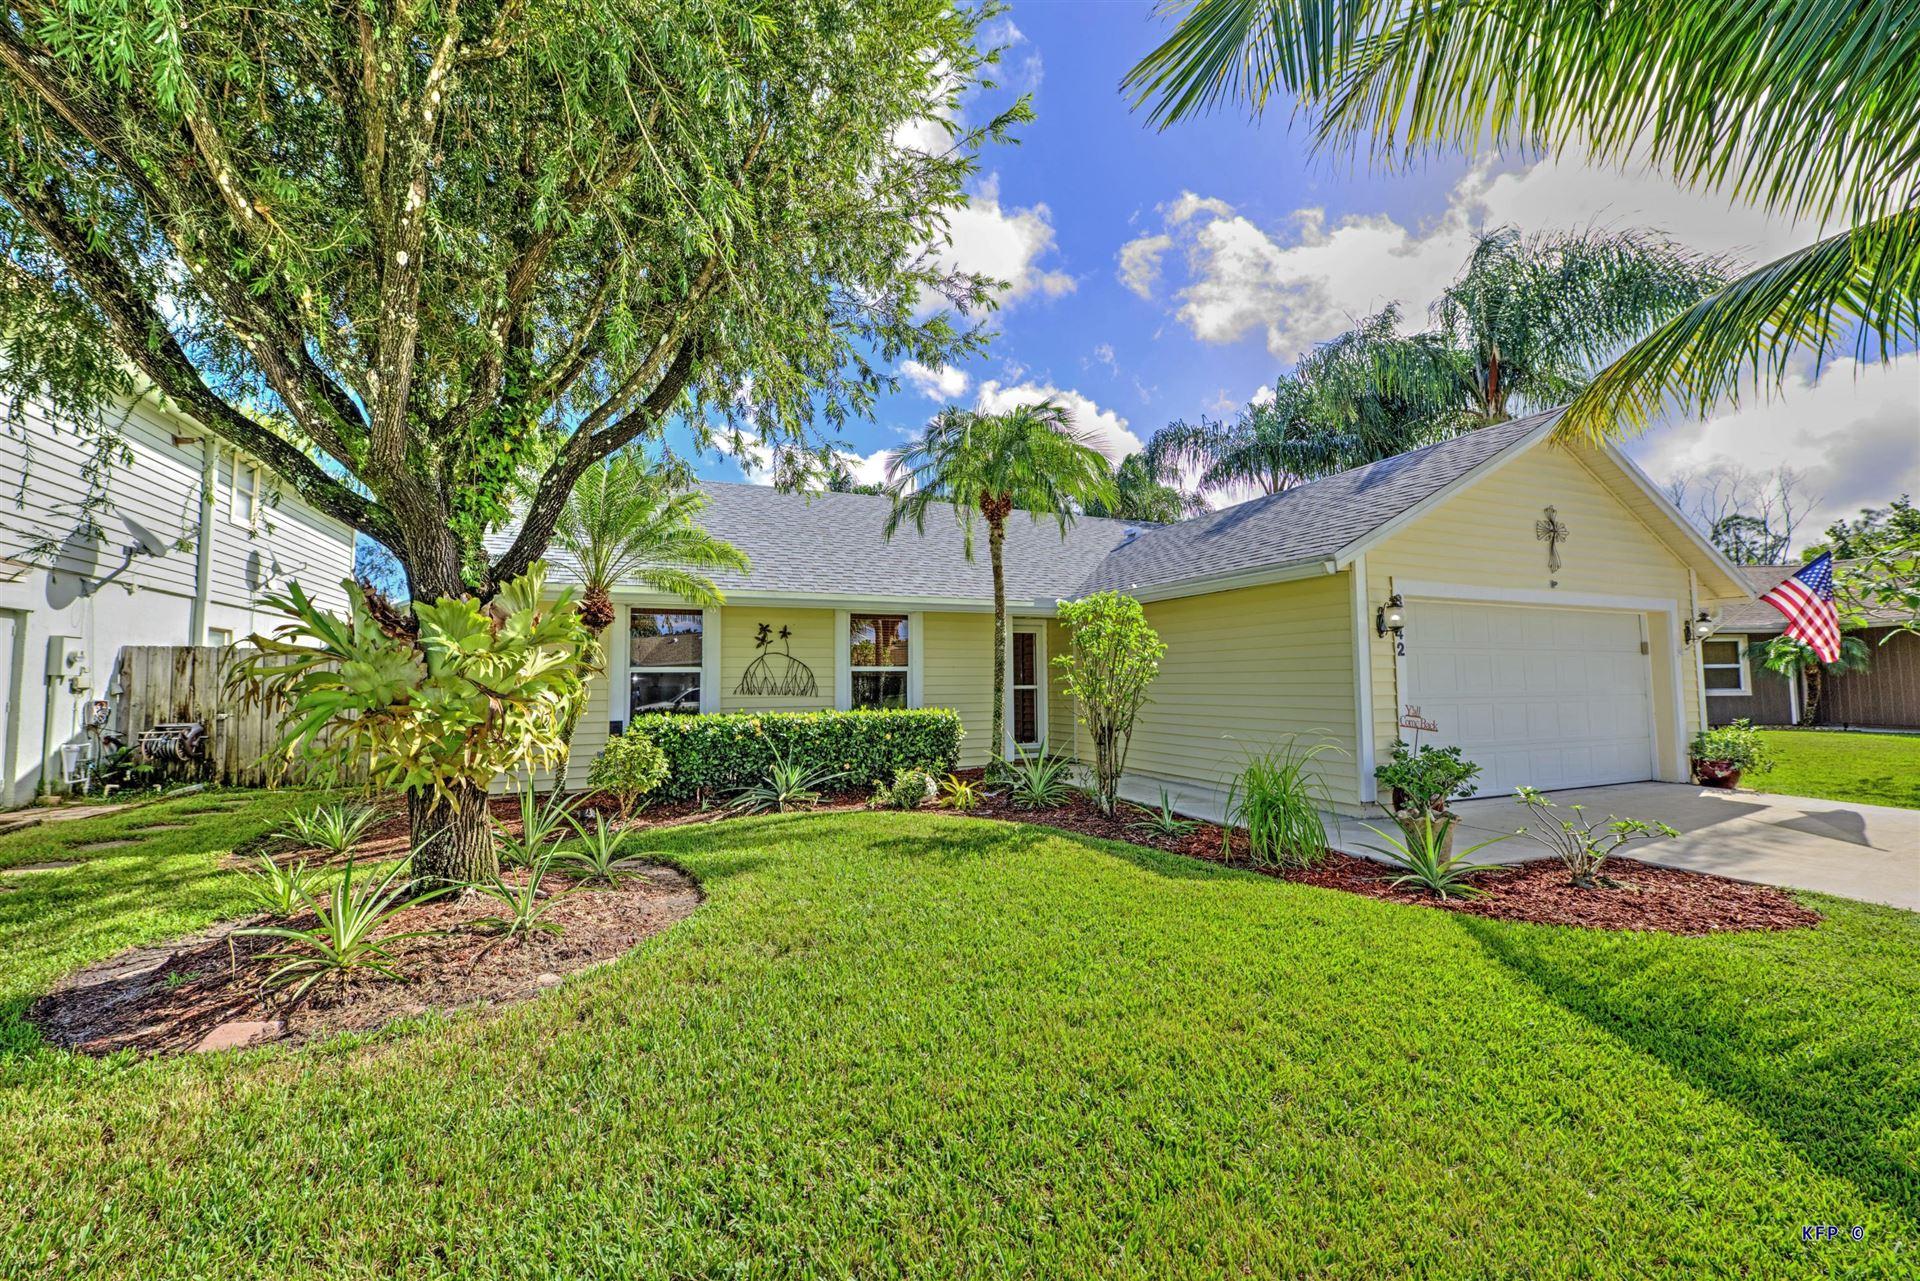 3942 SE Walnut Place, Stuart, FL 34997 - #: RX-10666957